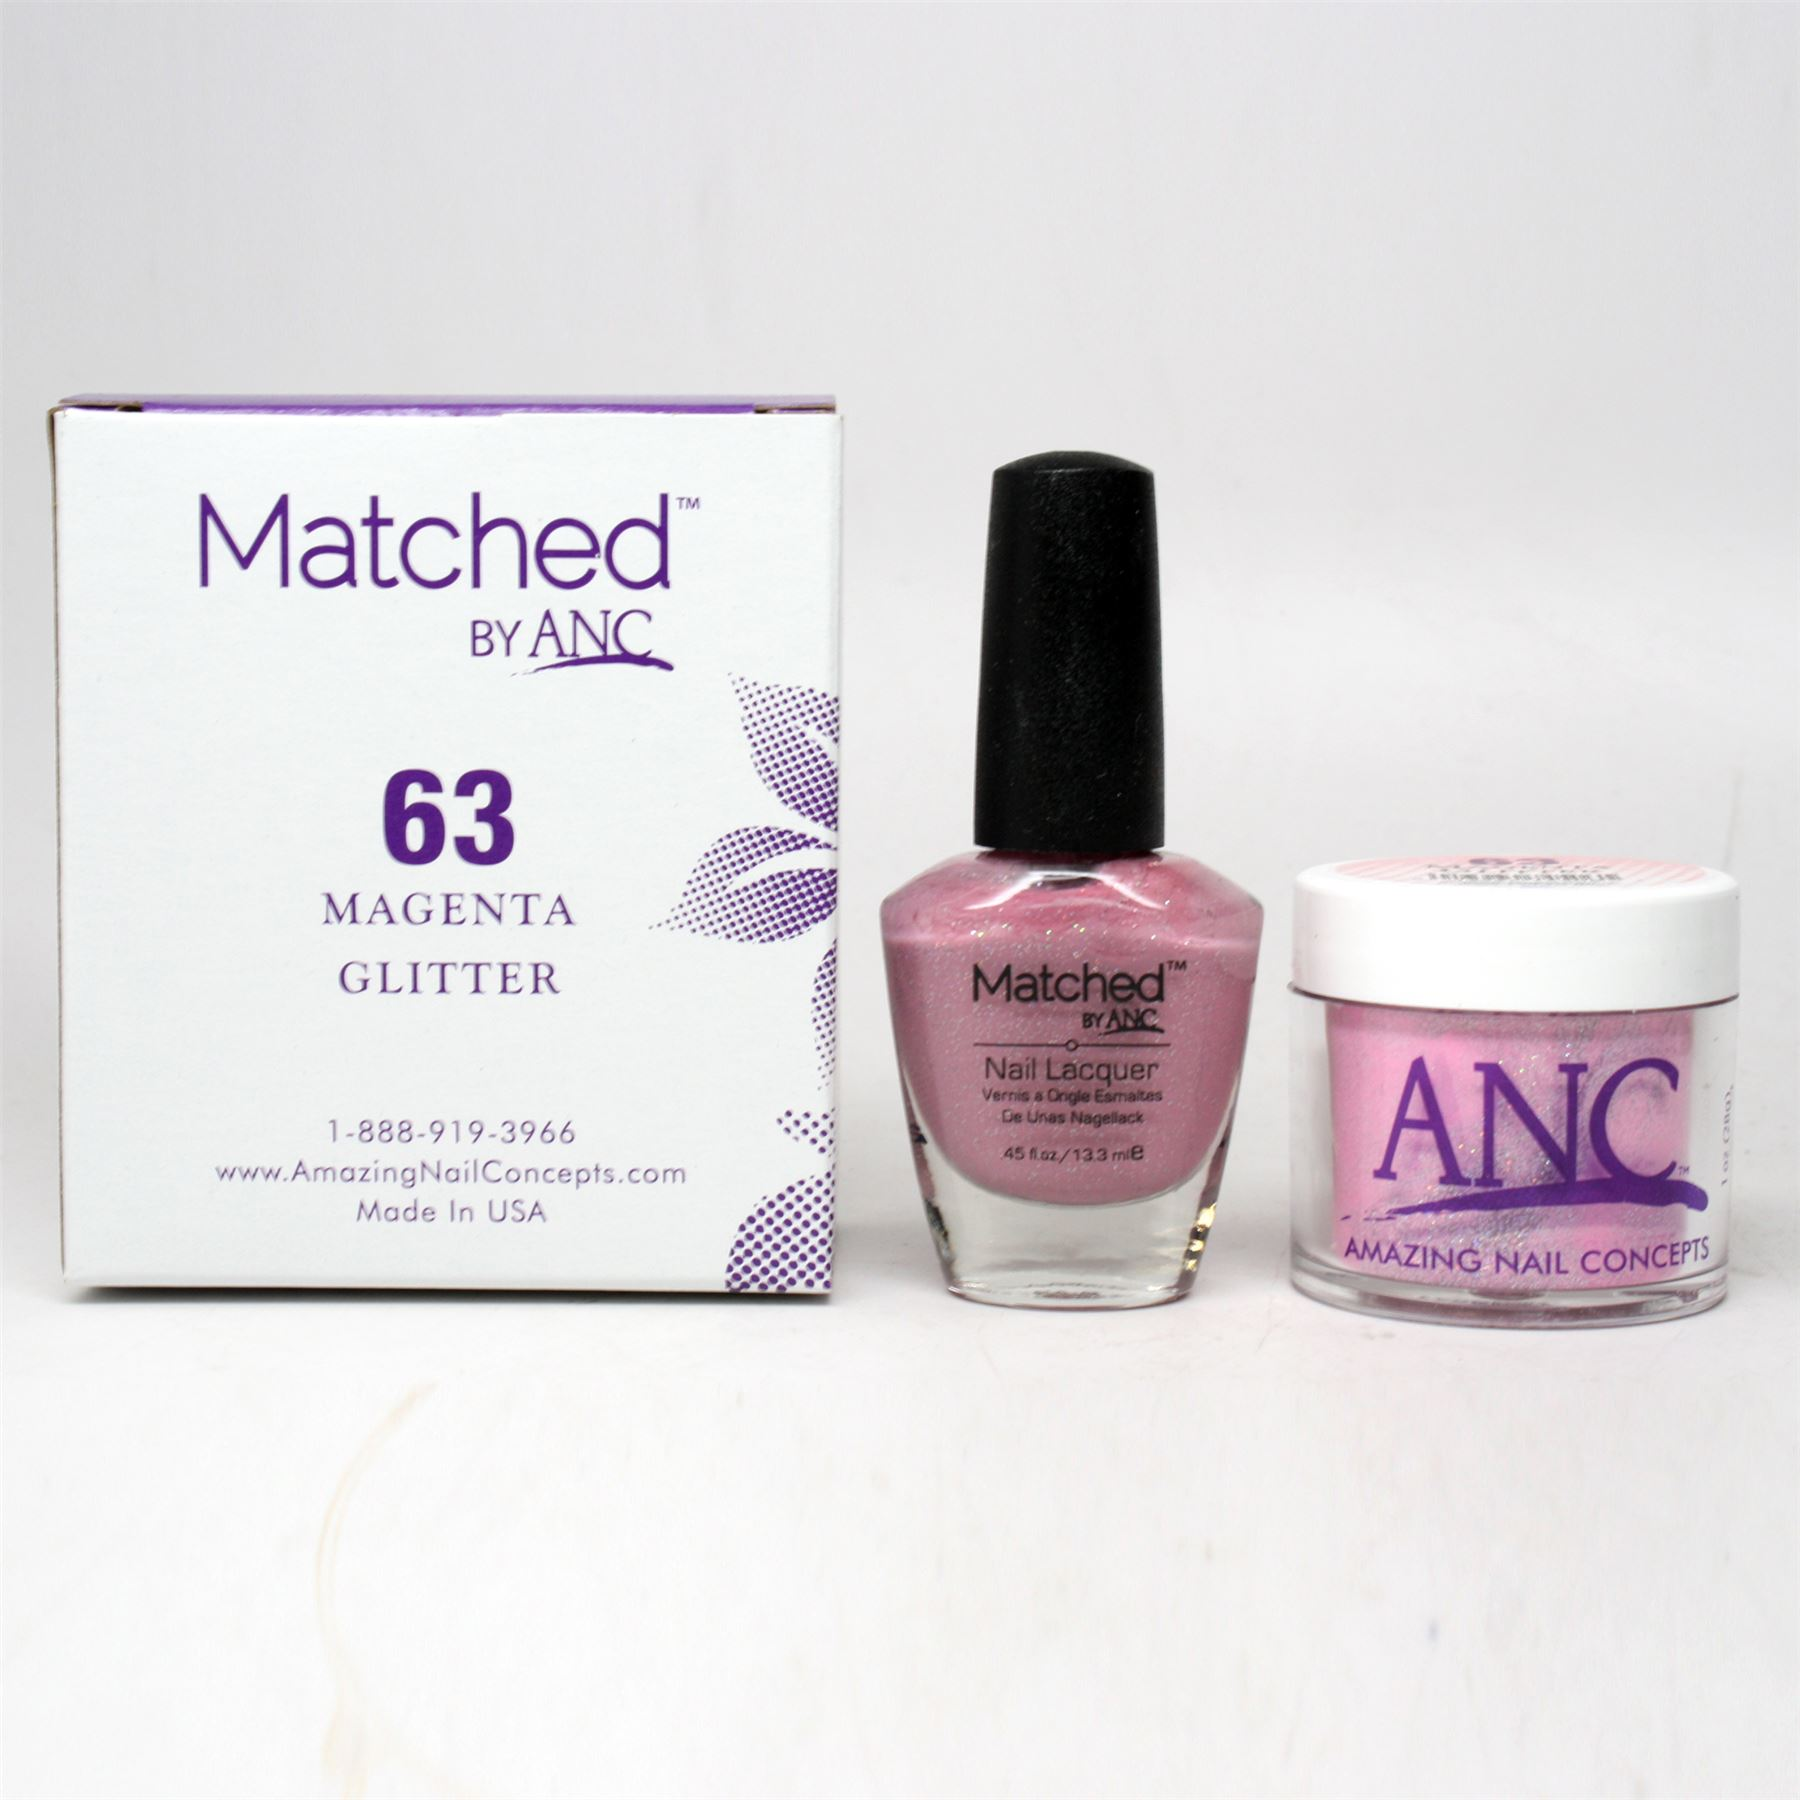 ANC Amazing Nail Concepts Matched Kit # 63 Magenta Glitter